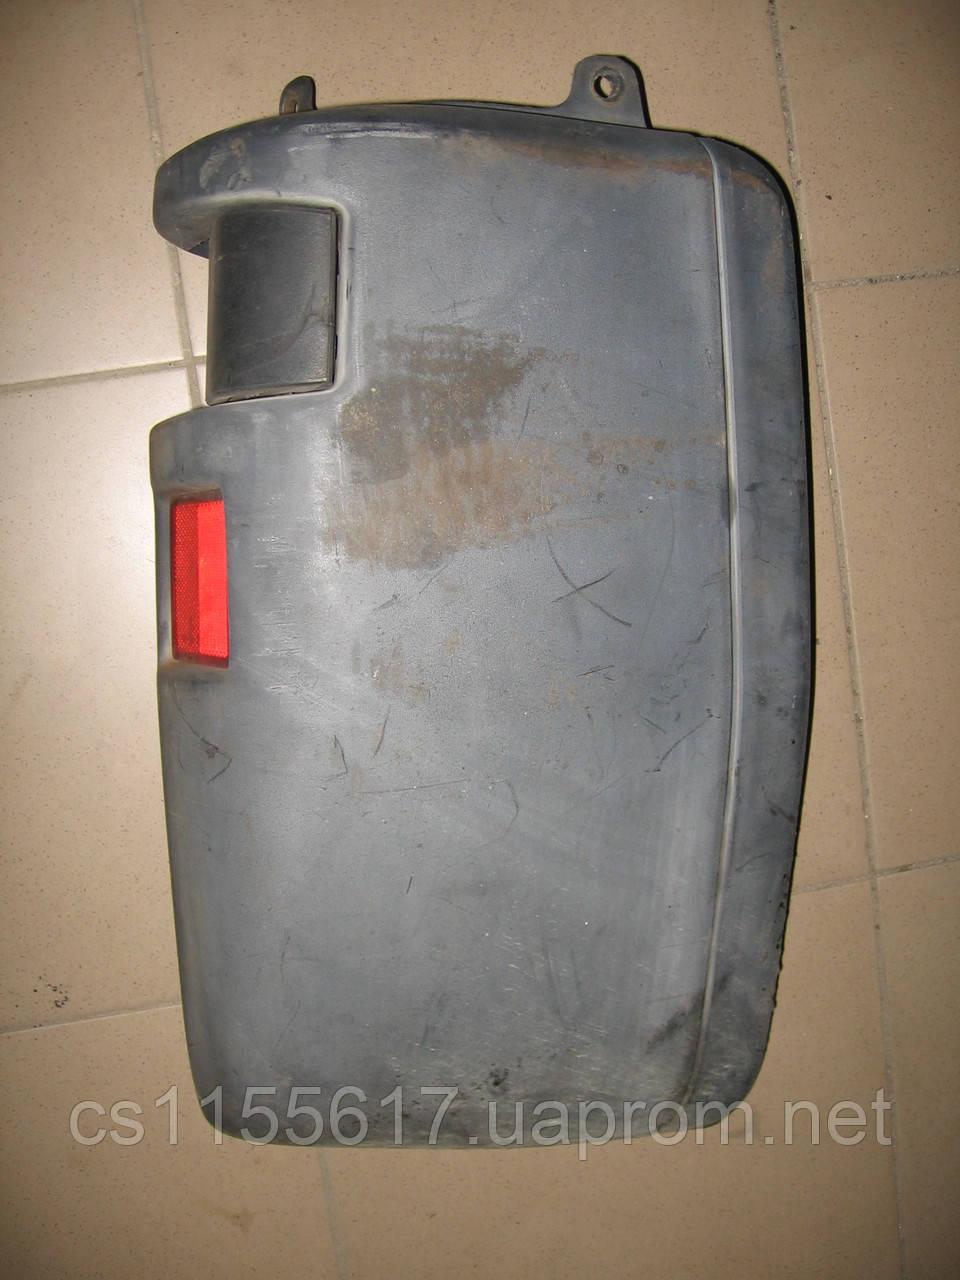 Правый клык заднего бампера 1300180070 б/у на Fiat Ducato, Peugeot Boxer, Citroen Jumper 1994-2002 год